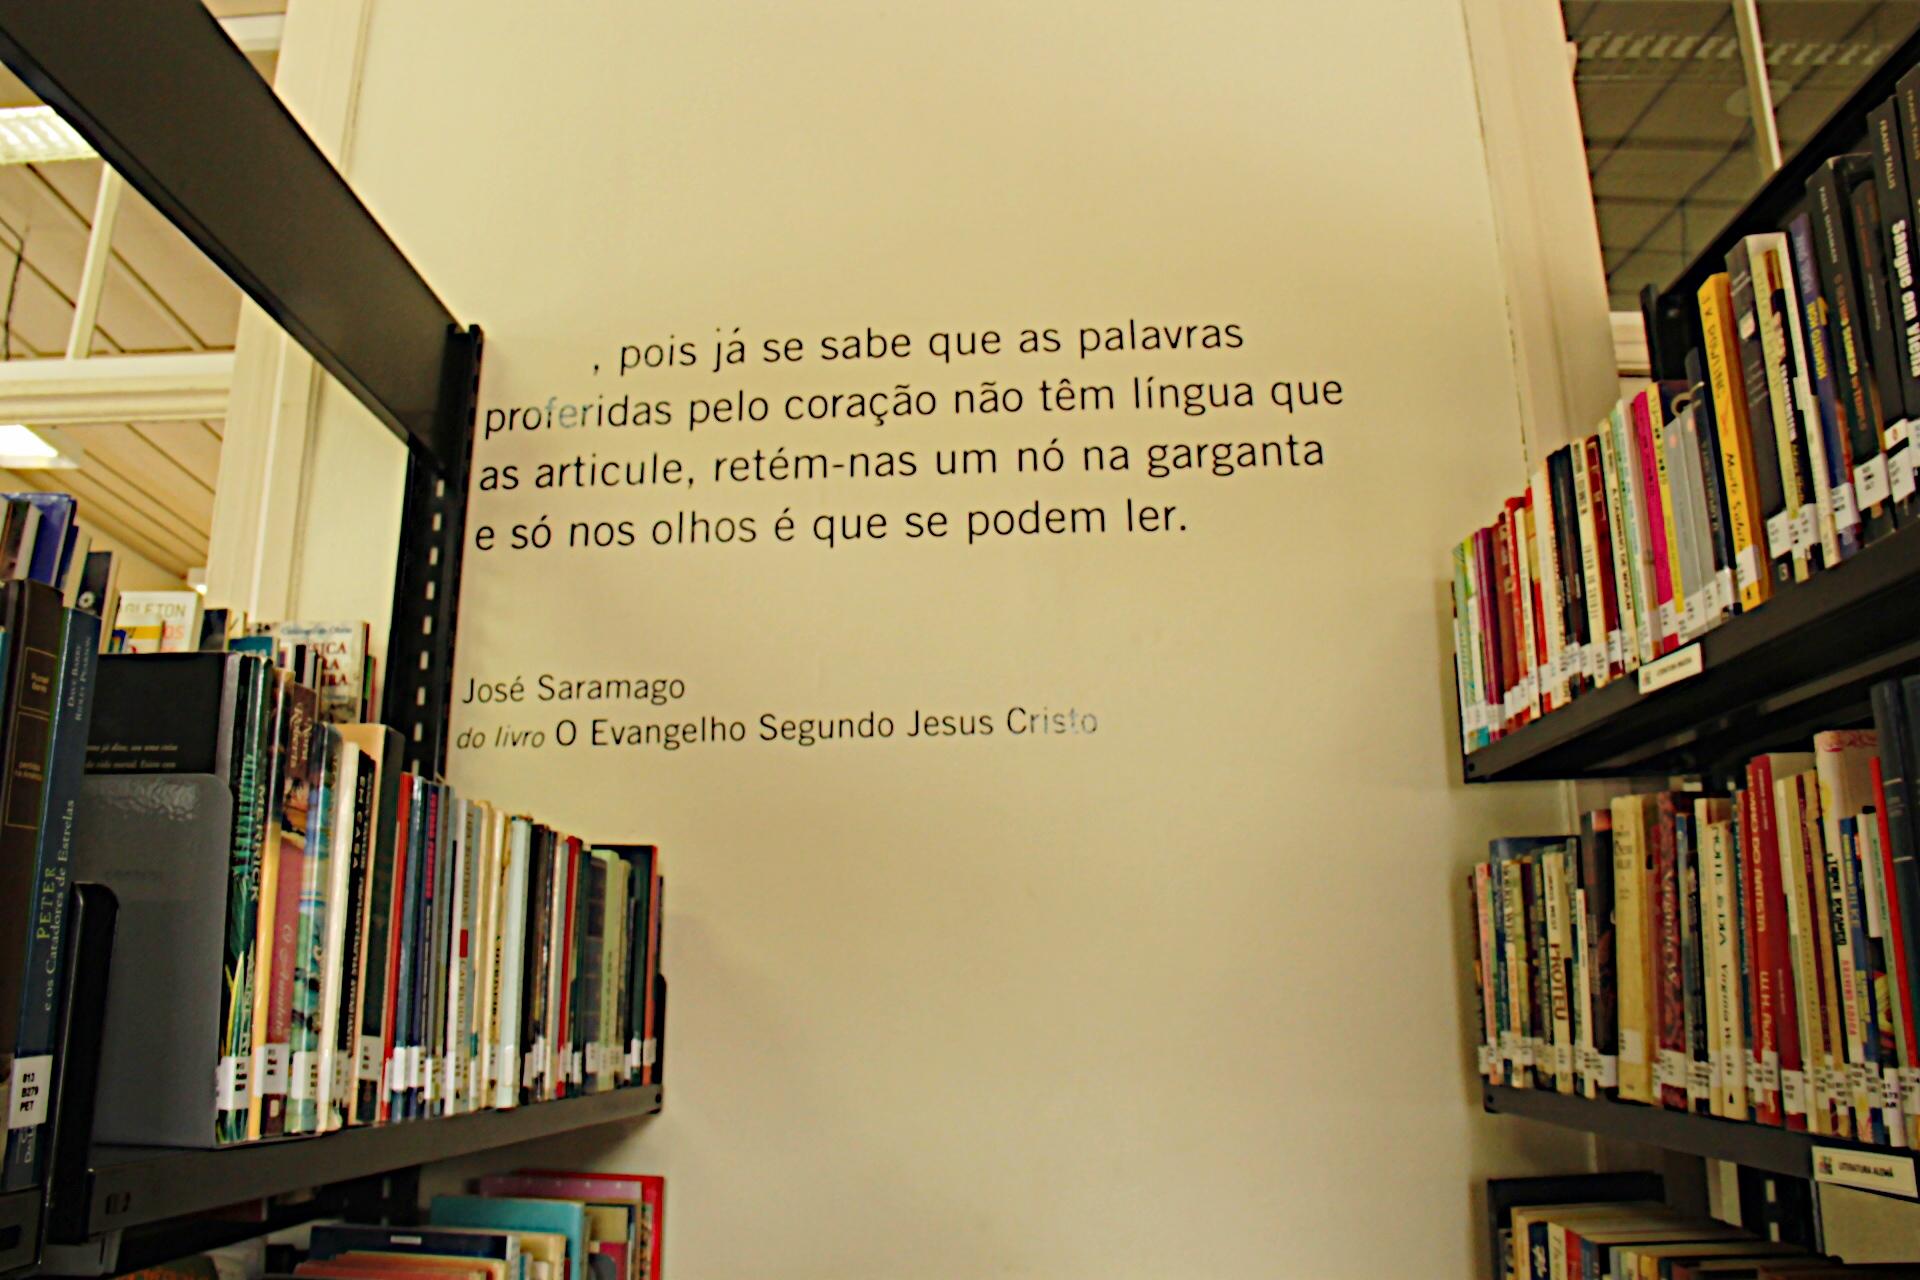 Casa da Leitura